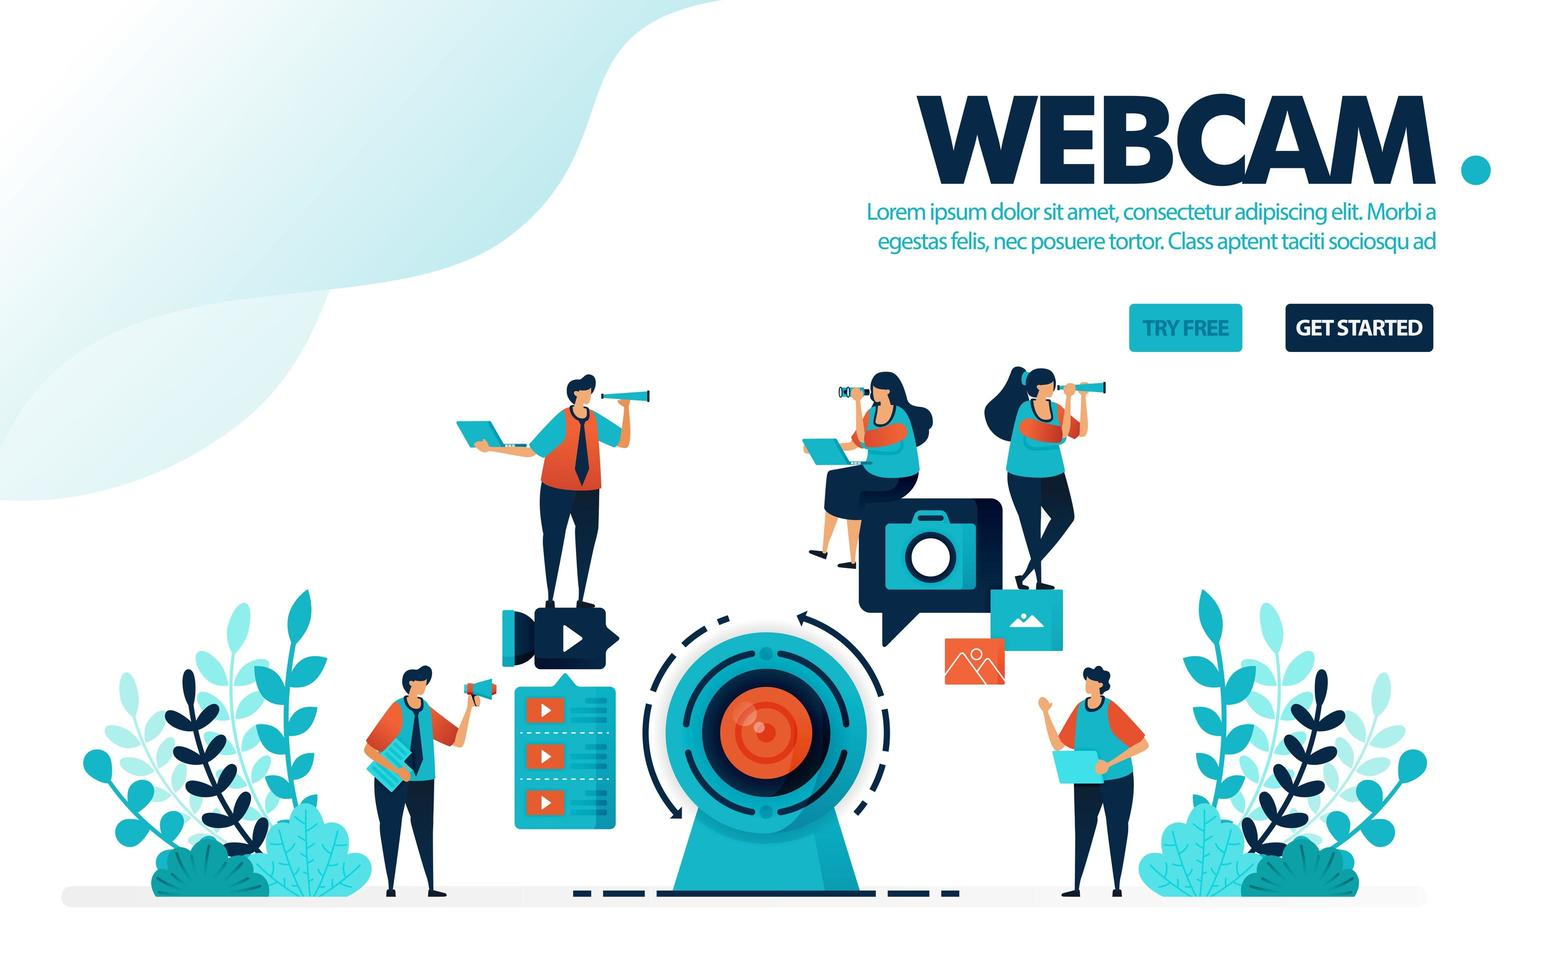 Vector illustration webcam camera. People record using a webcam for live streaming or webinars. Social media video content for vlog. Designed for landing page, web, banner, template, flyer, poster